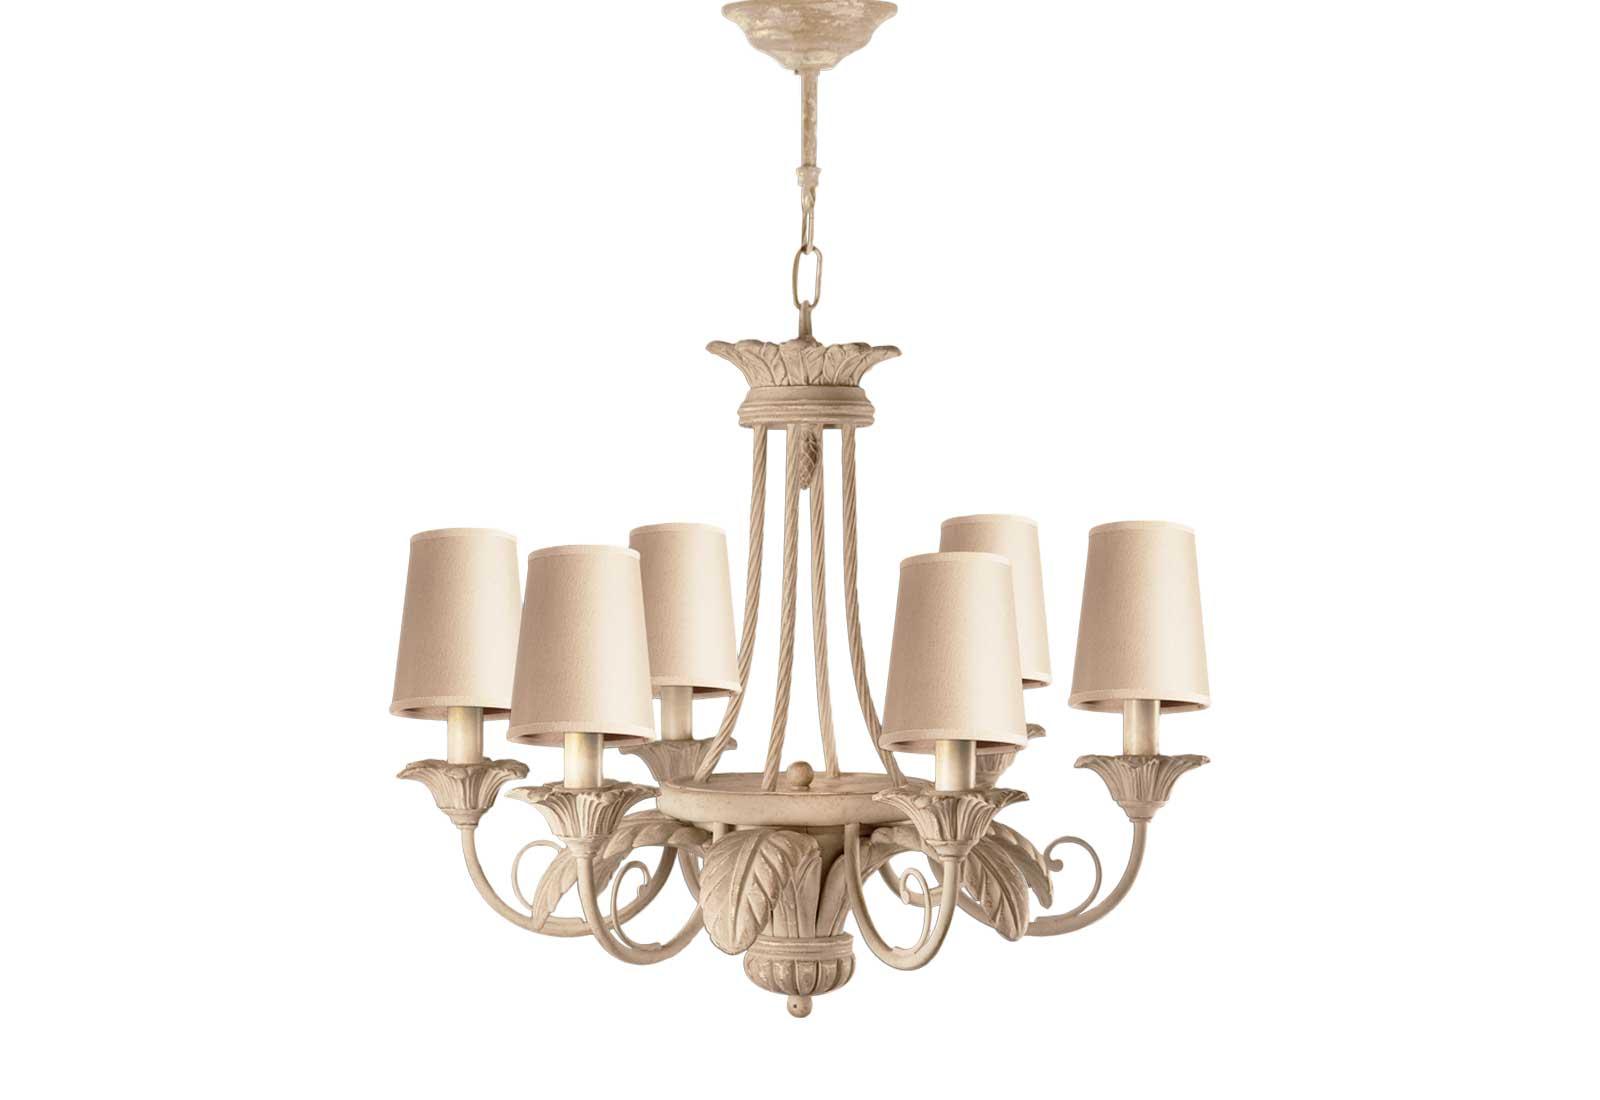 Camilla villaverde london villaverde london camilla wood chandelier 01 aloadofball Choice Image